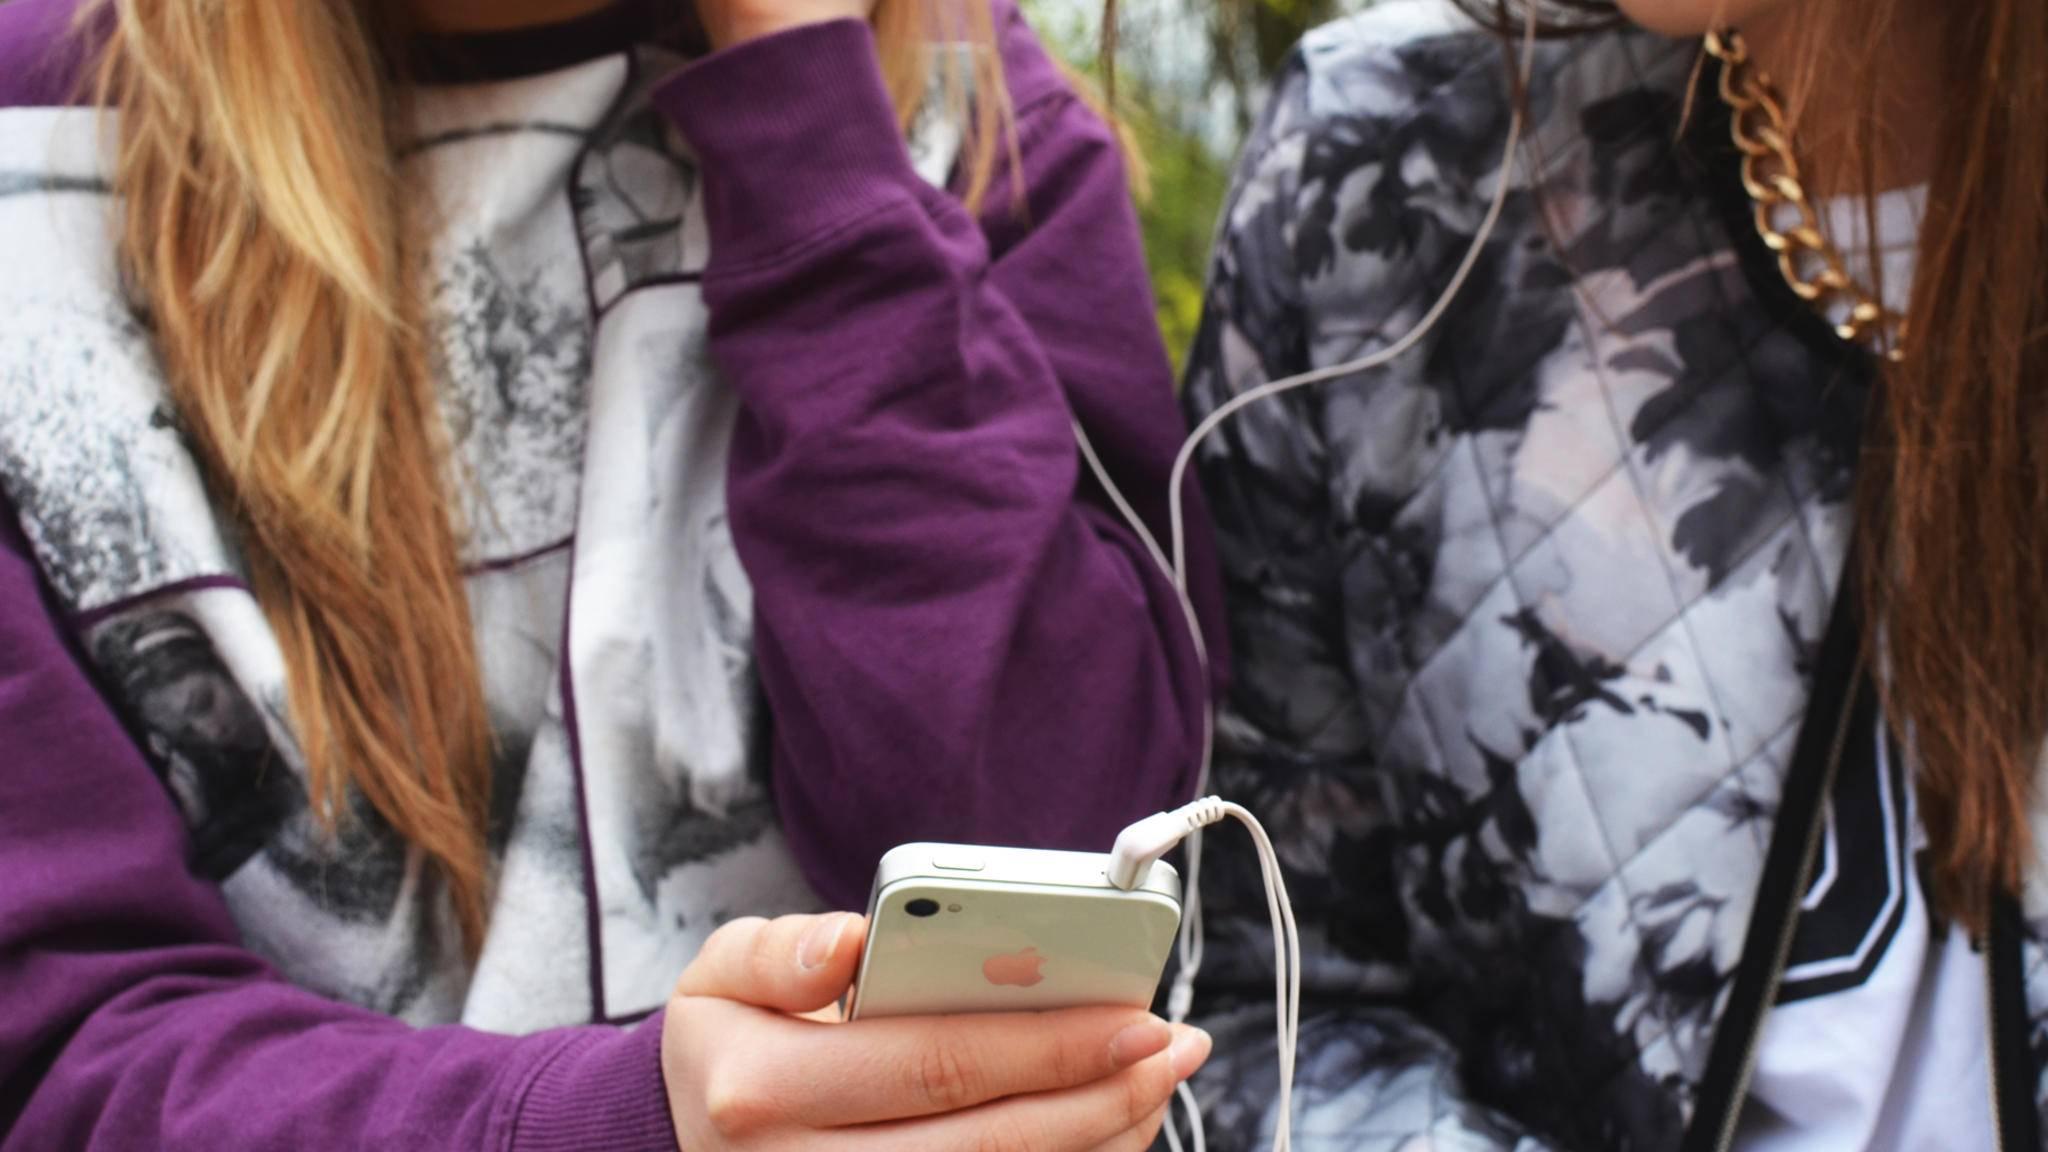 Musik Handy Smartphone Teens